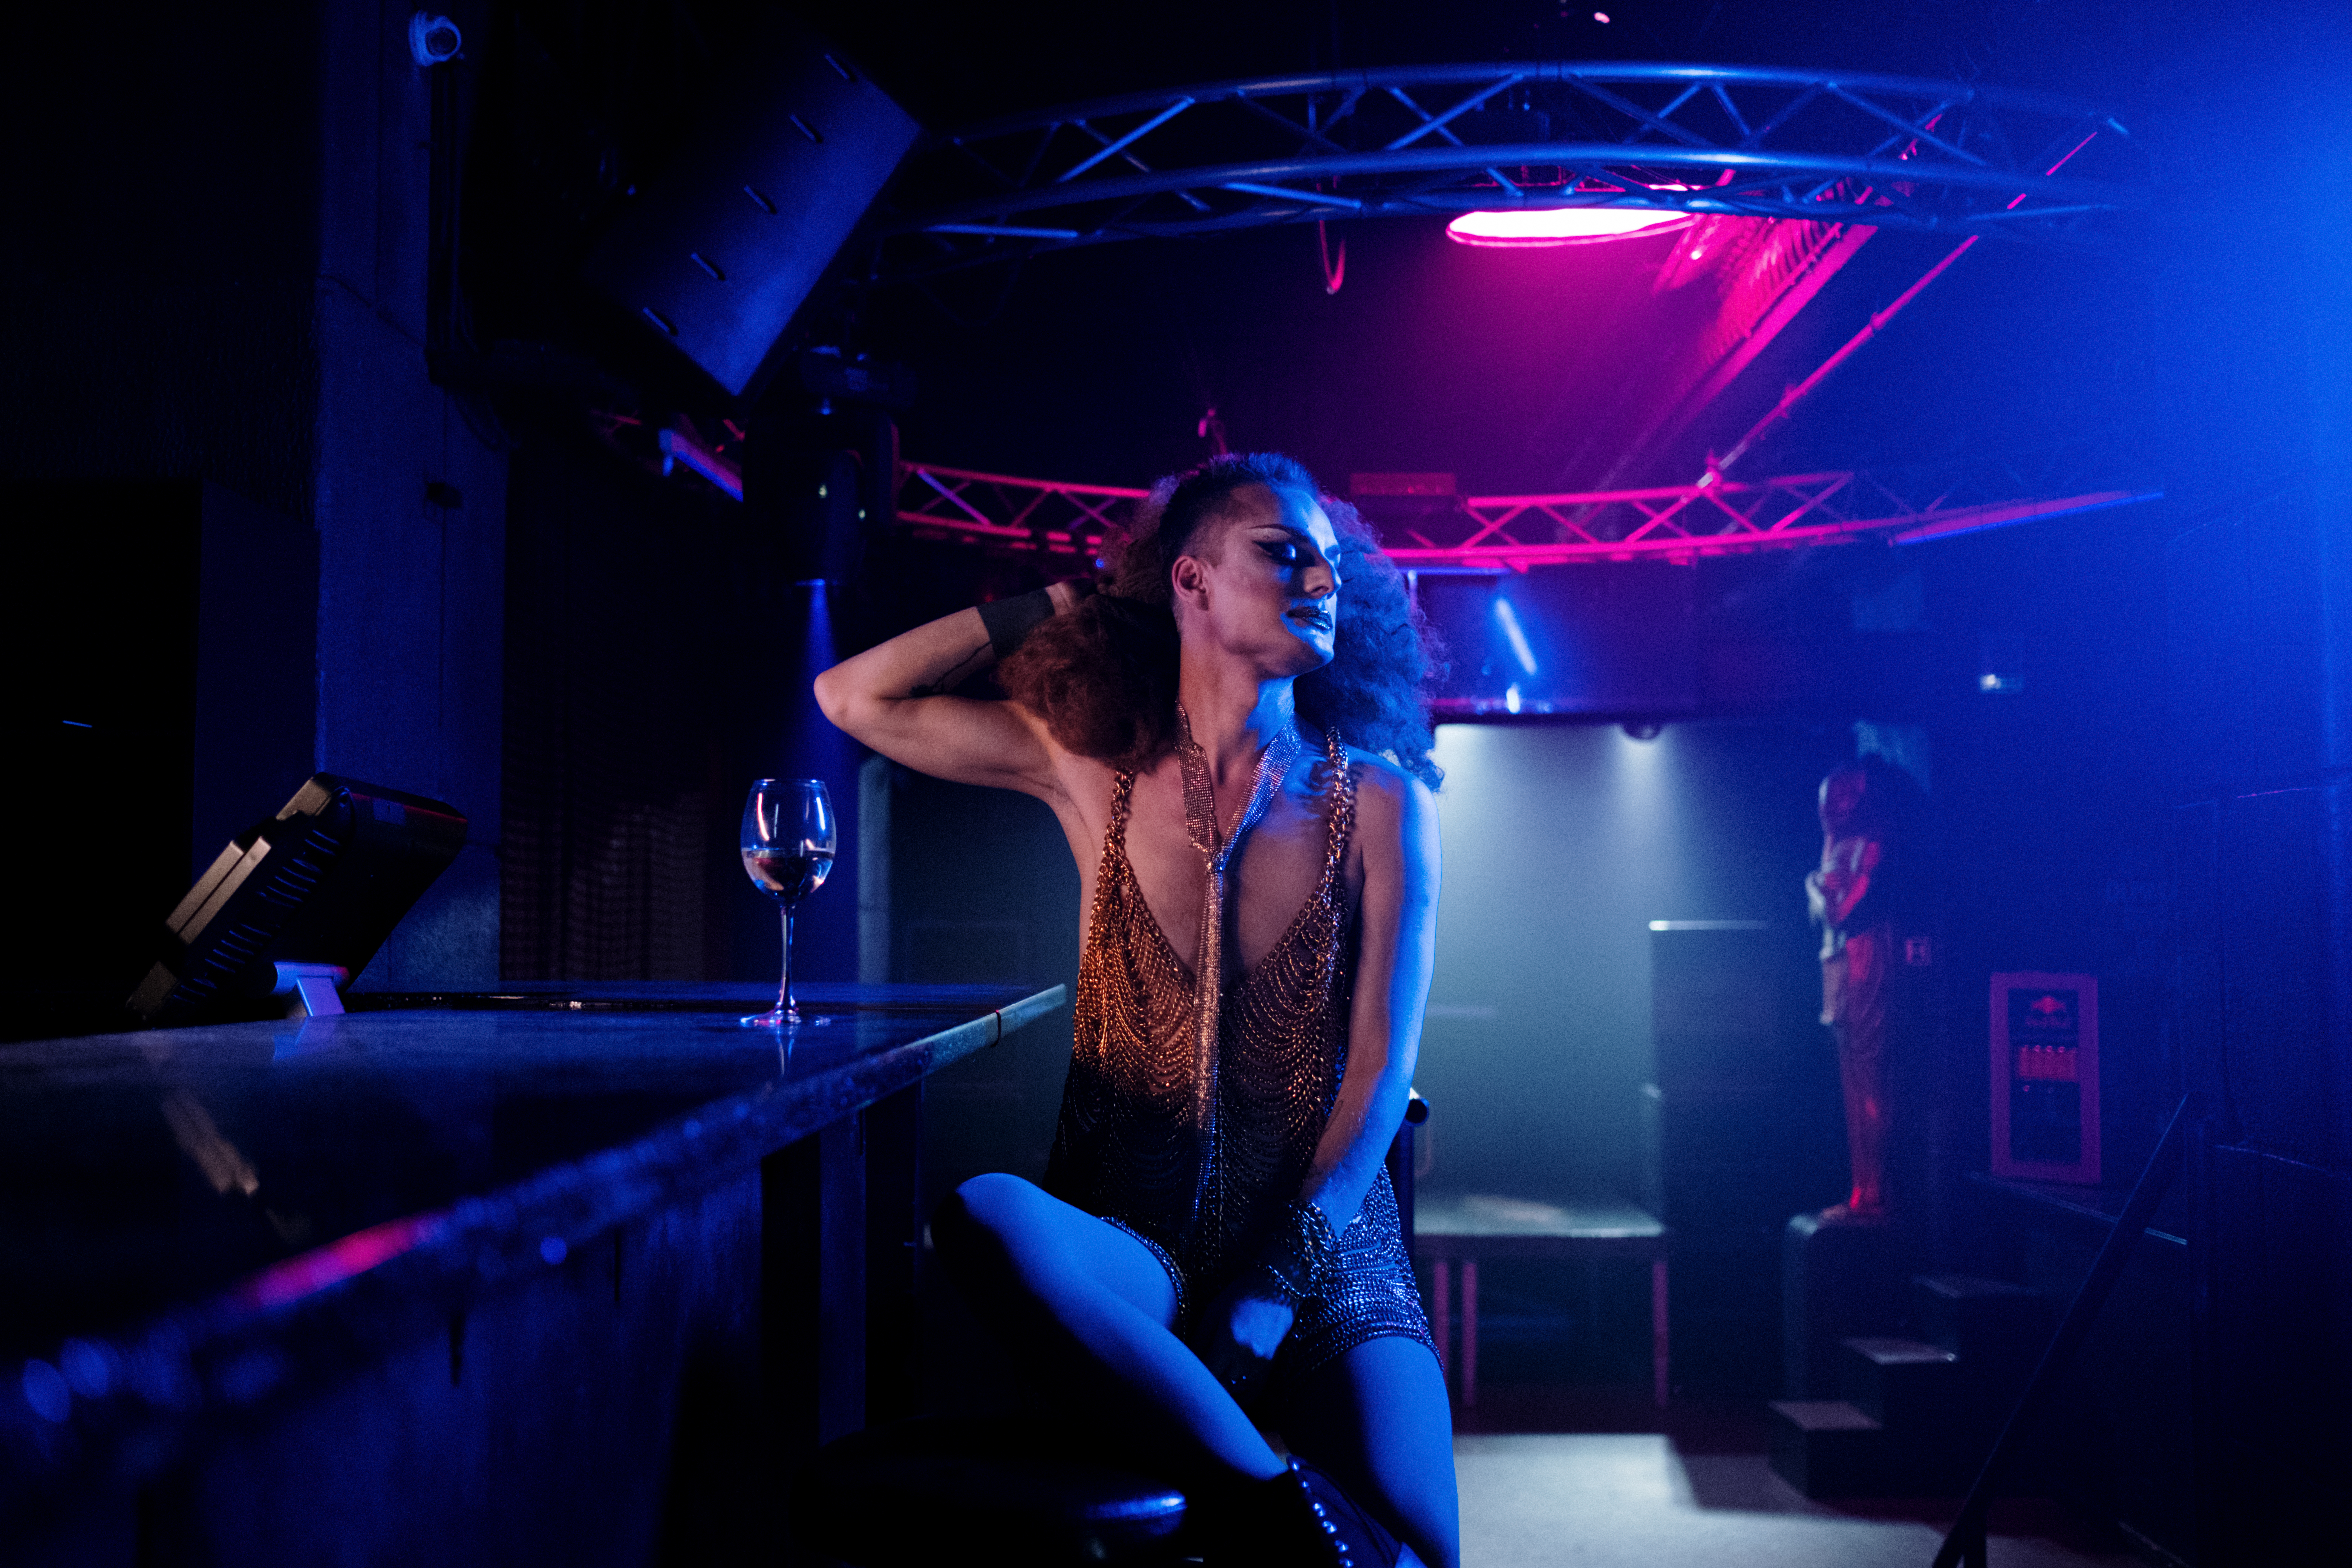 drag queen sitting at a bar